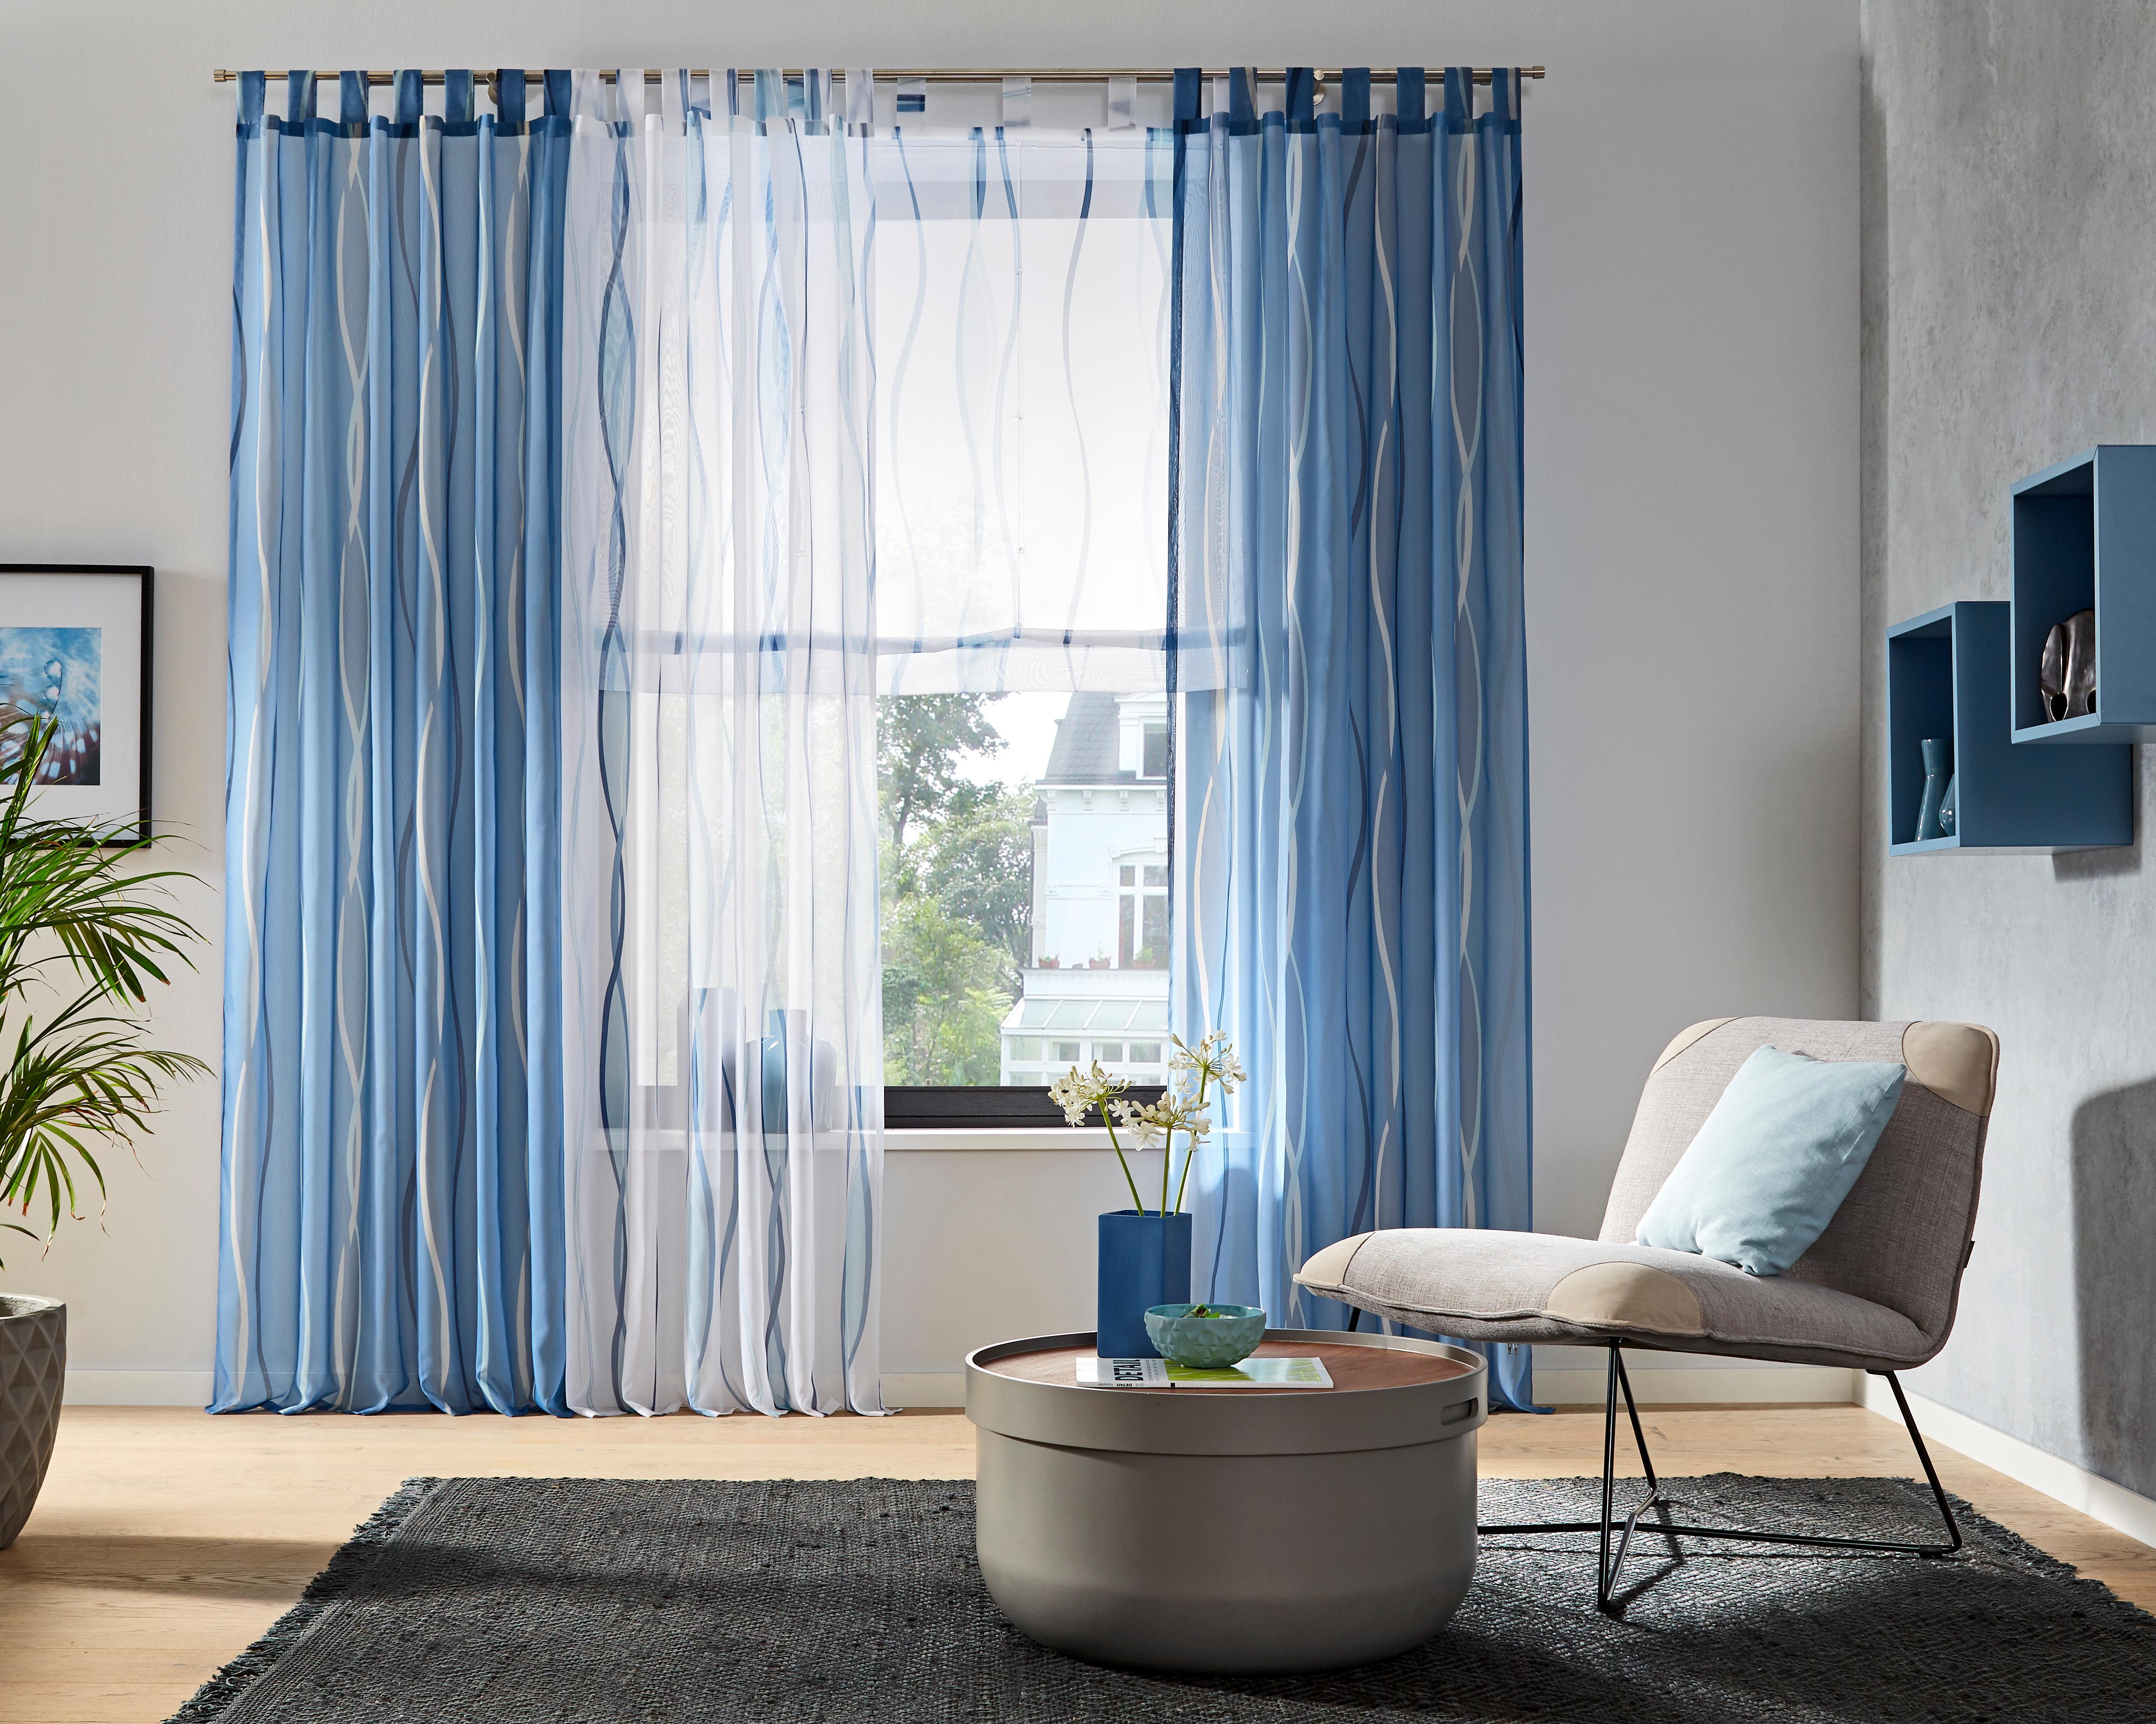 stoffe gardinen online shop with stoffe gardinen online shop simple stoffe with stoffe. Black Bedroom Furniture Sets. Home Design Ideas